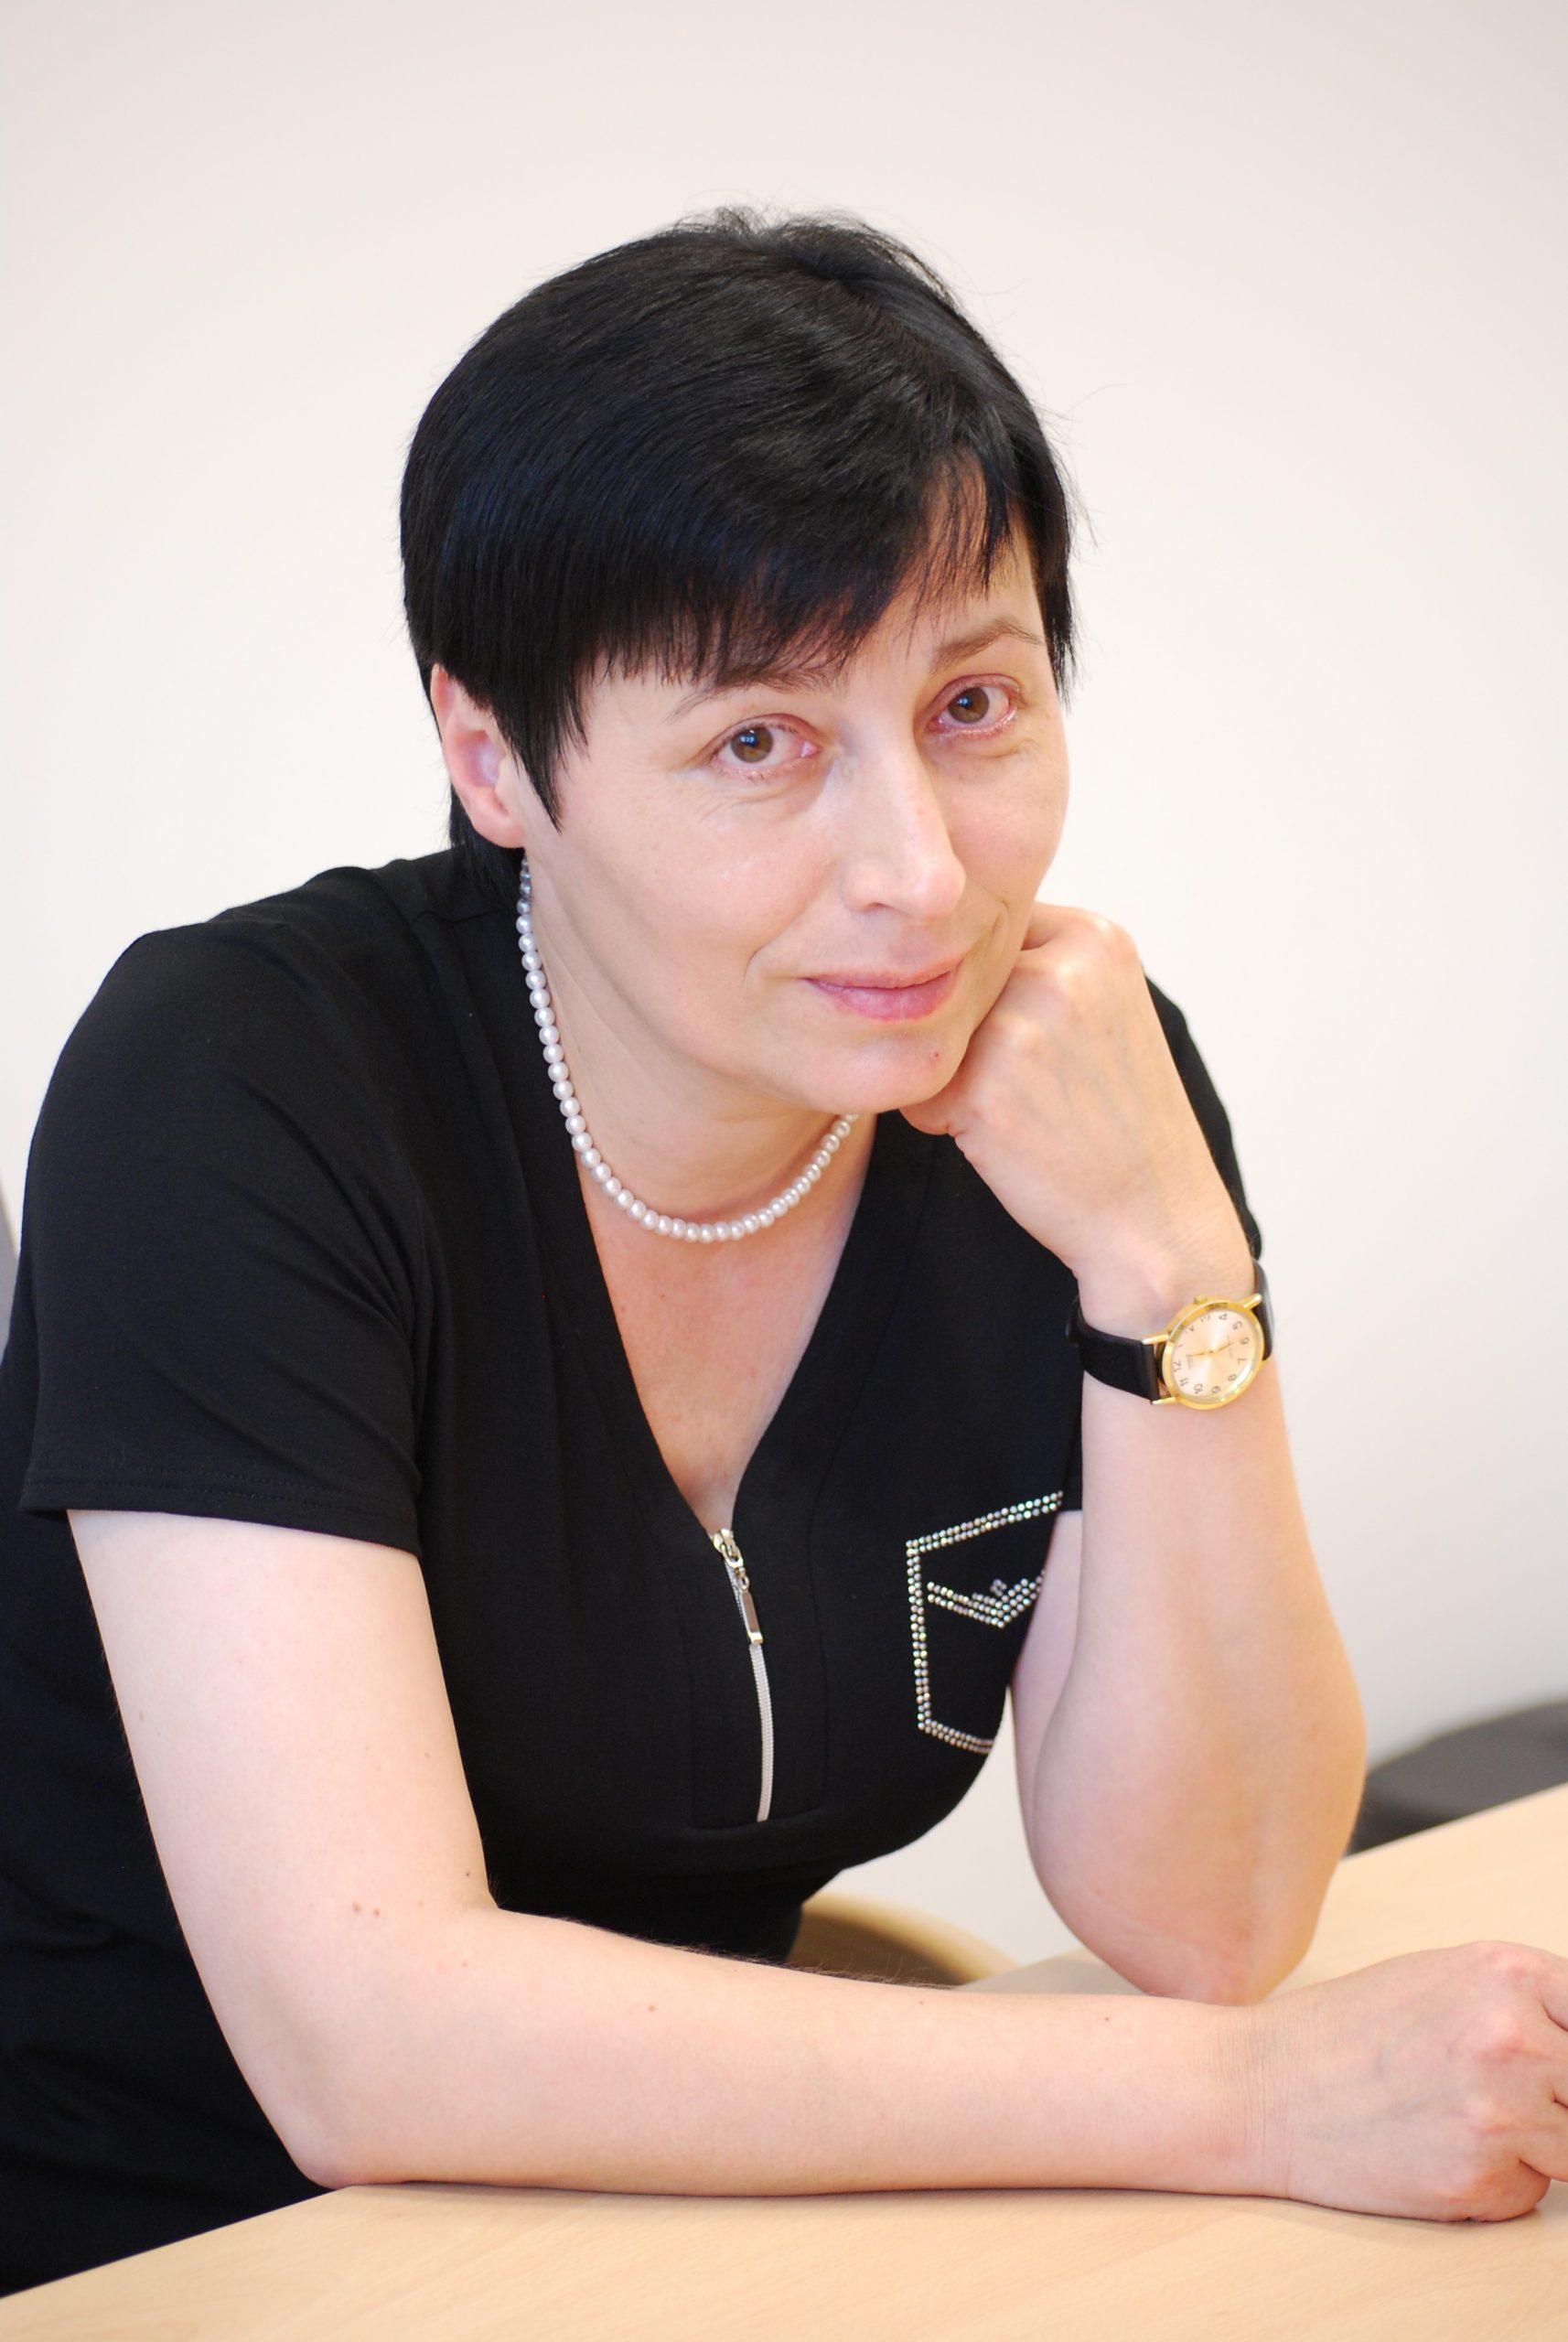 Violetta Machnicka